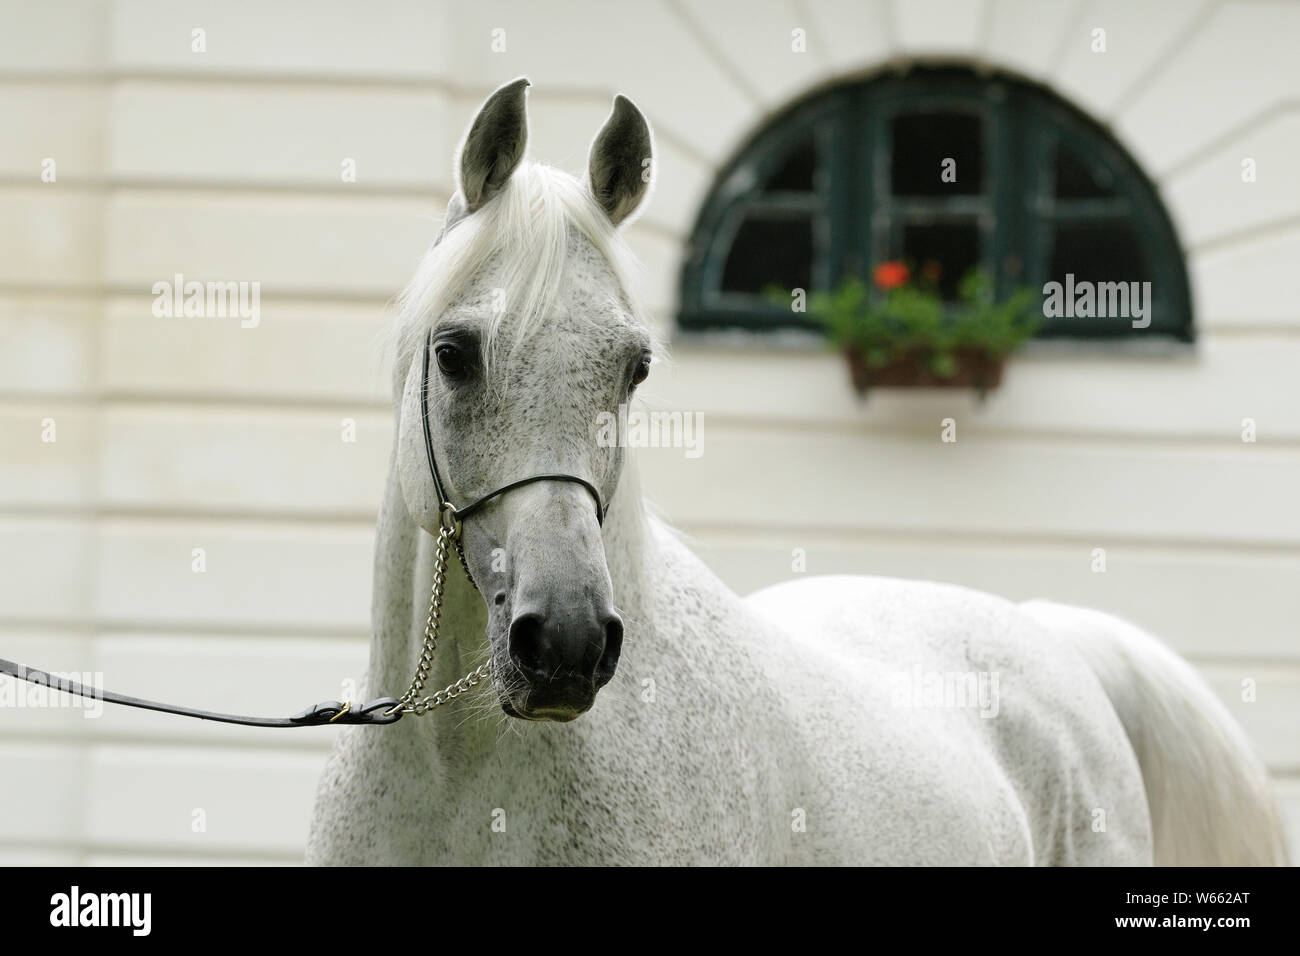 White Arabian Horse Stallion With Showholster Stock Photo Alamy